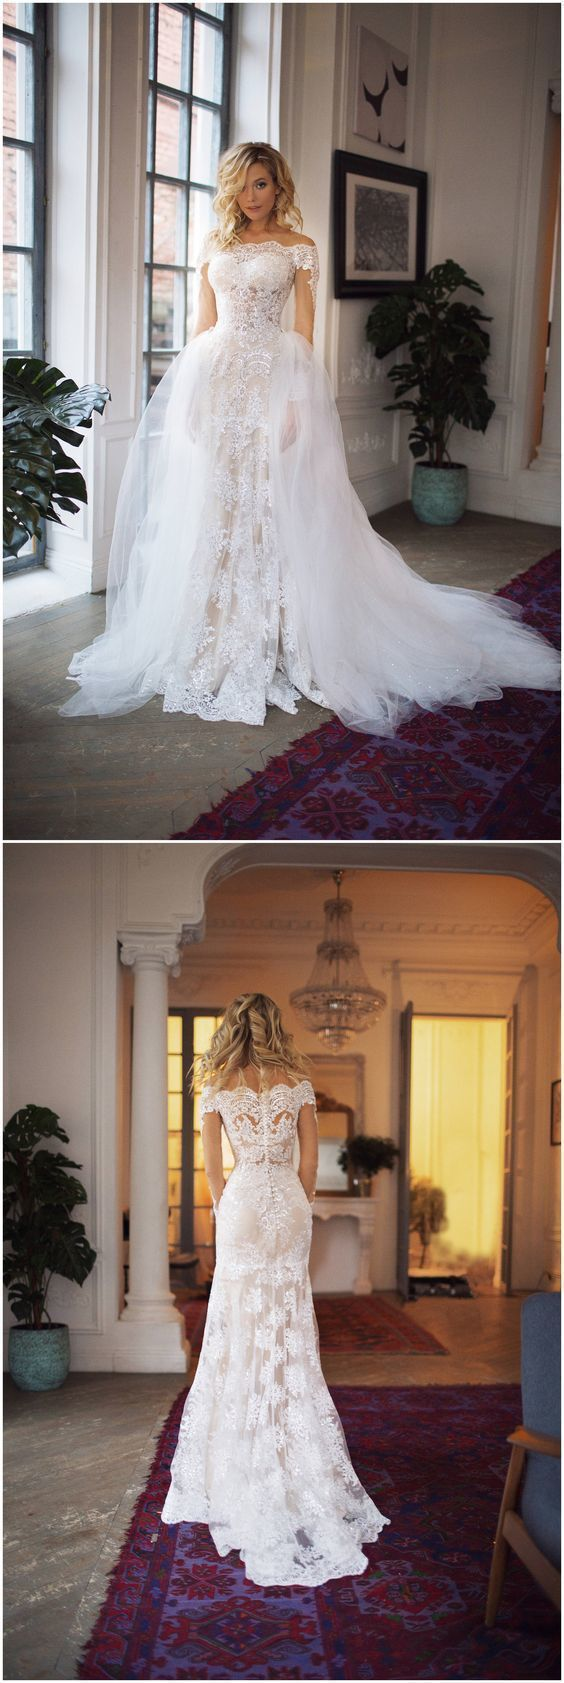 Mermaid Wedding Dress lace wedding gowns sexy wedding dresses